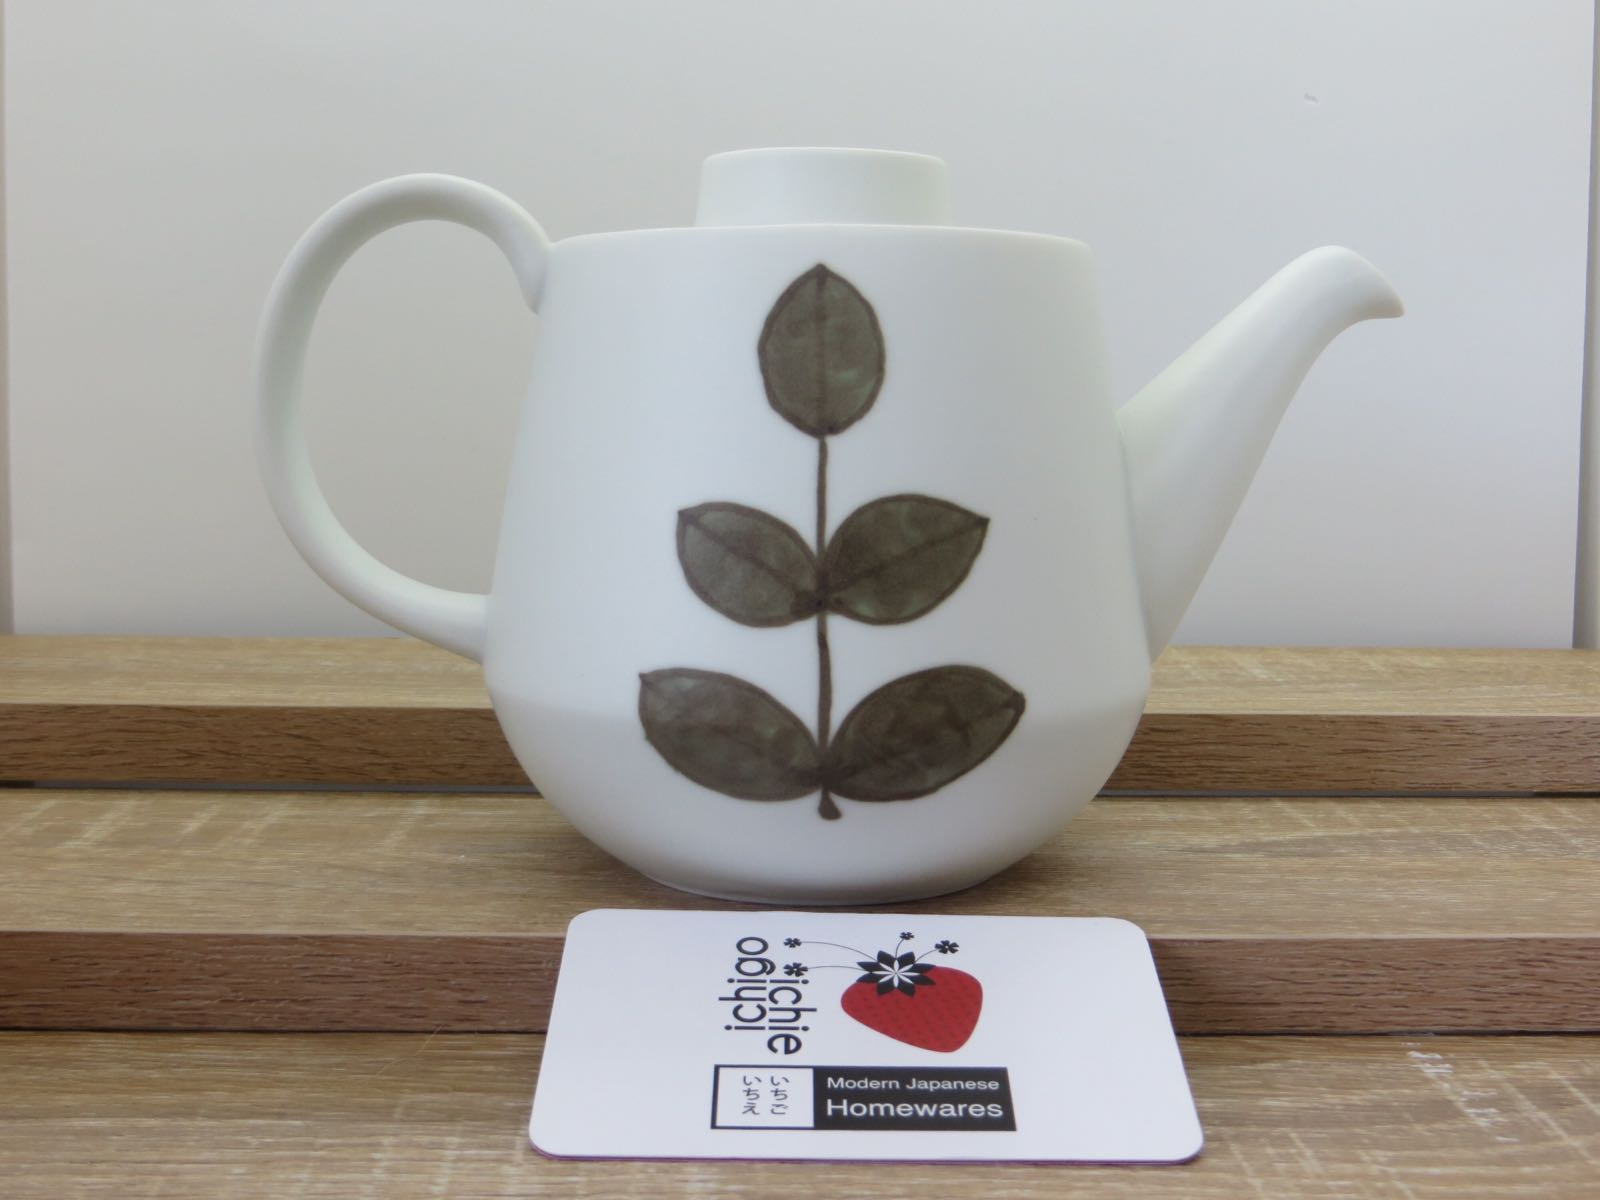 KIHARA Fiore Tea Pot